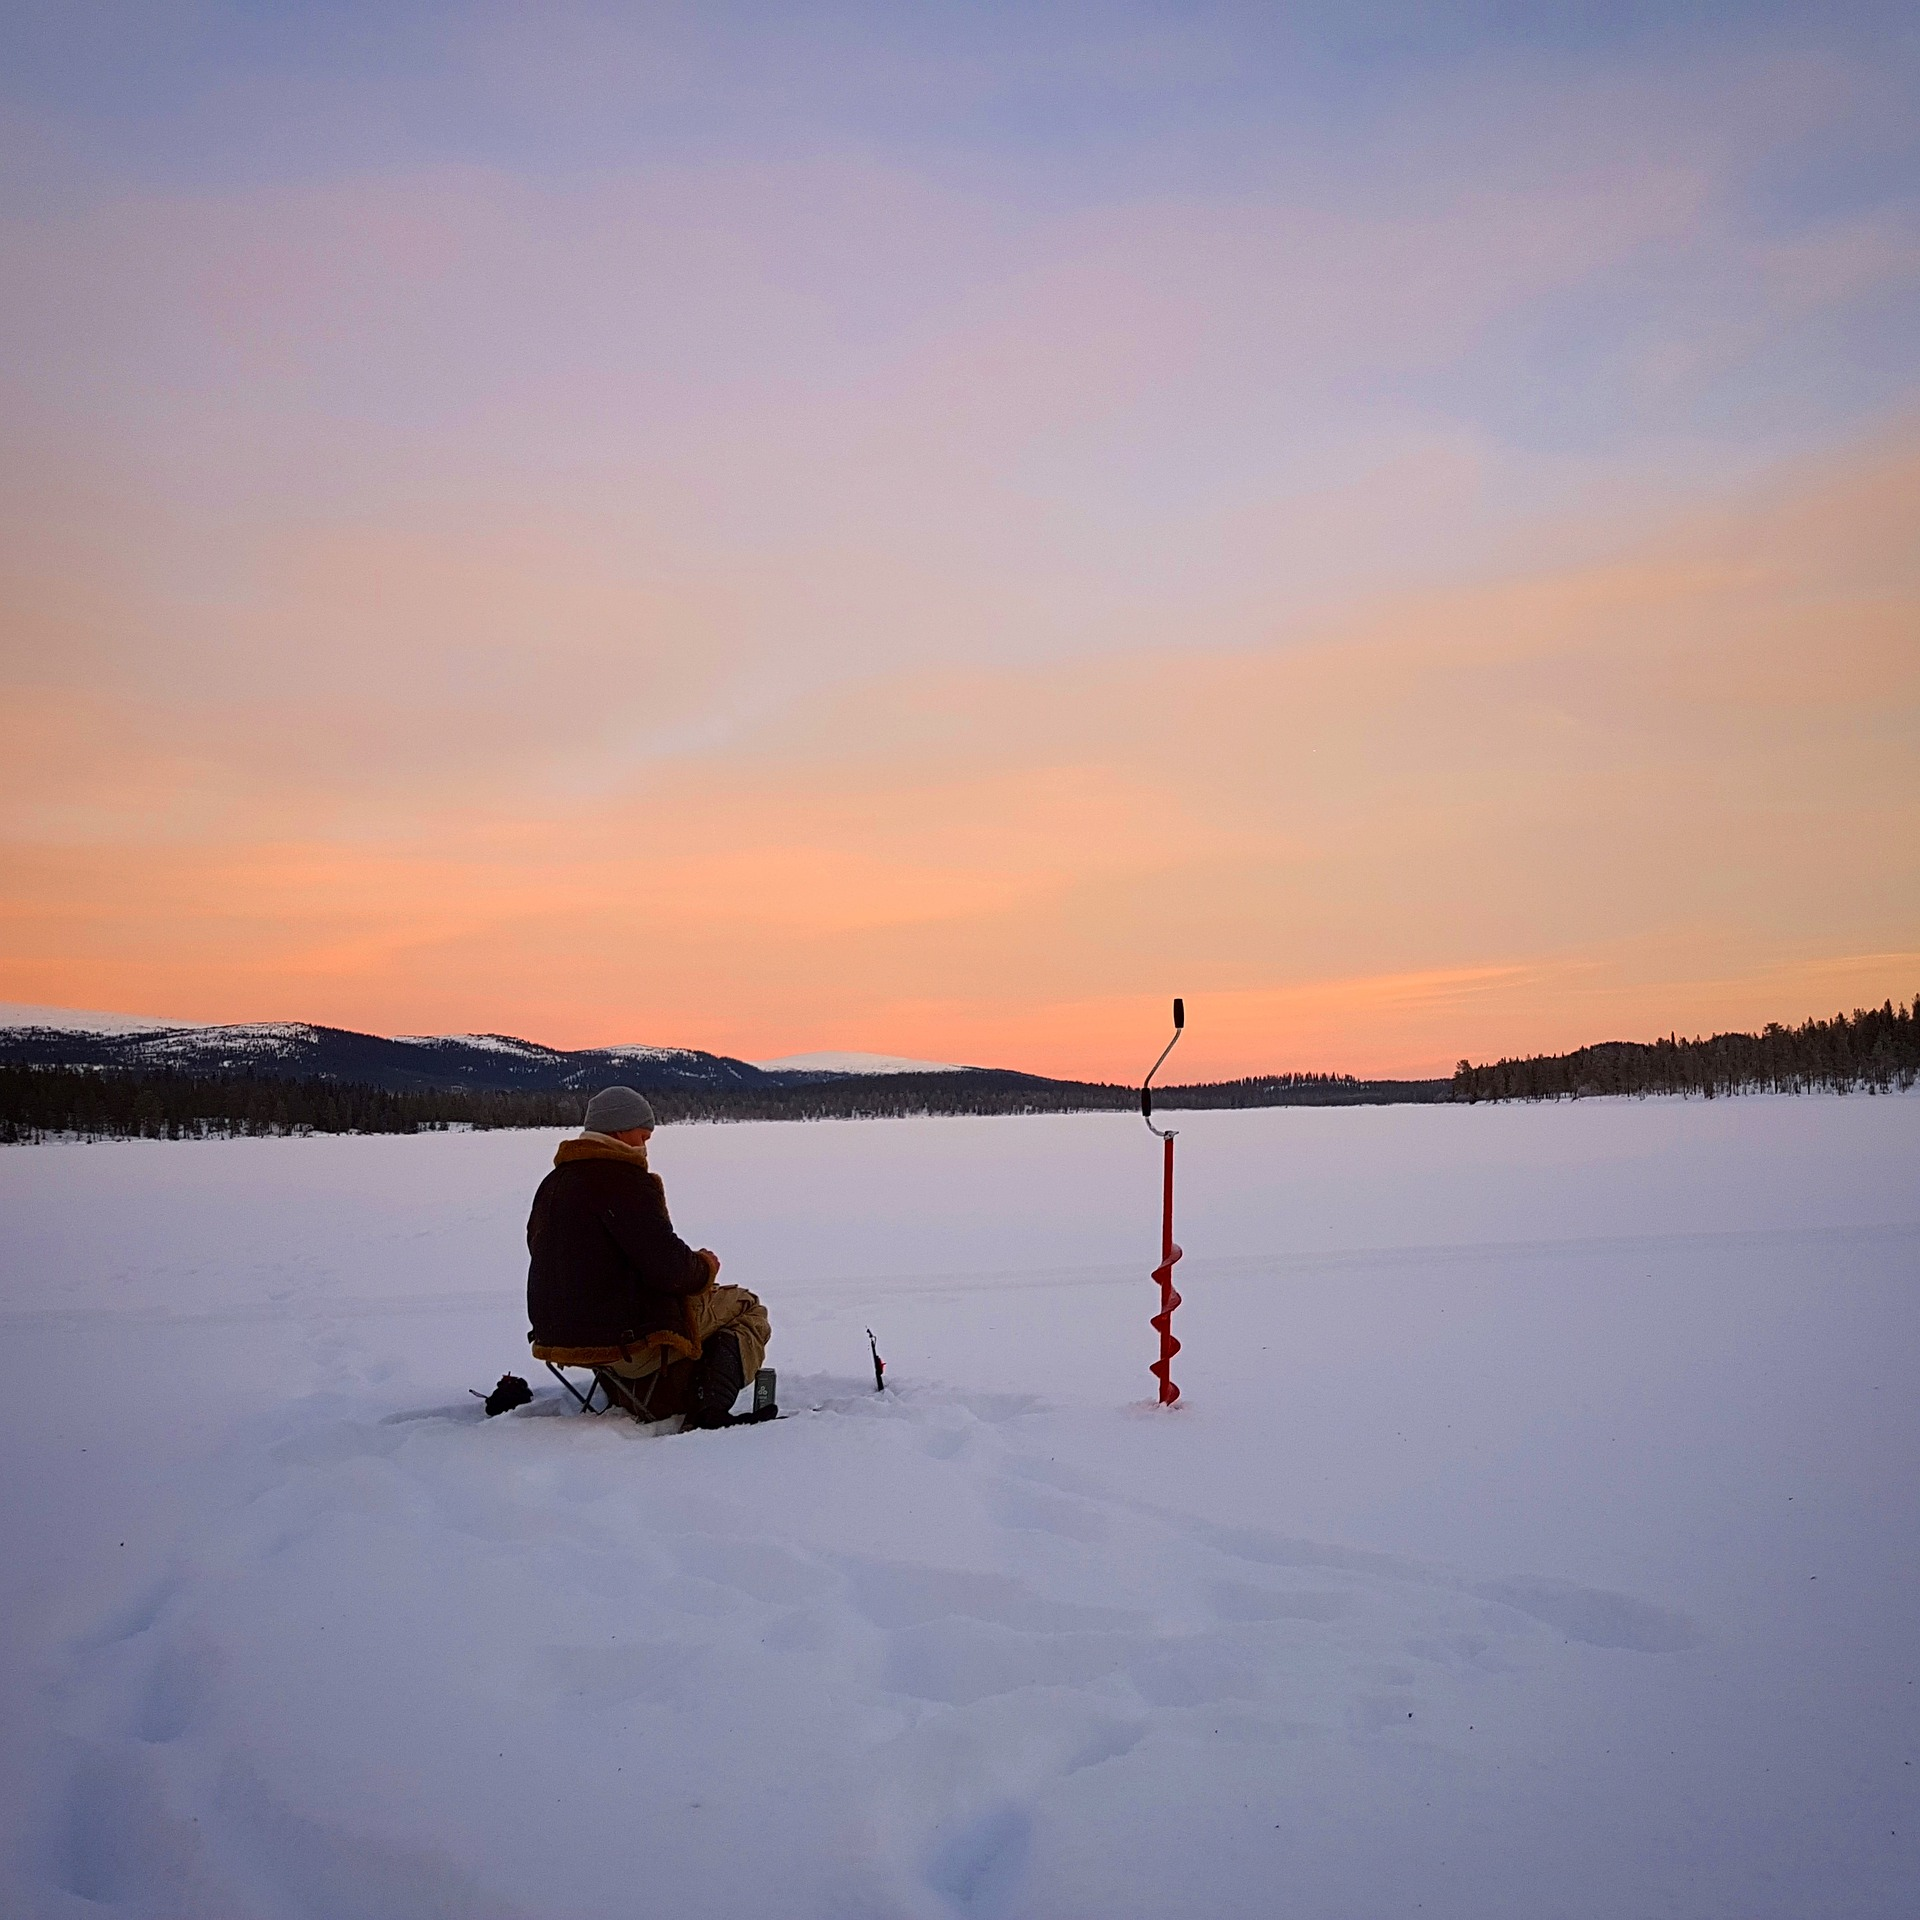 Ice Fishing pescando gelo liturgia russa rússia